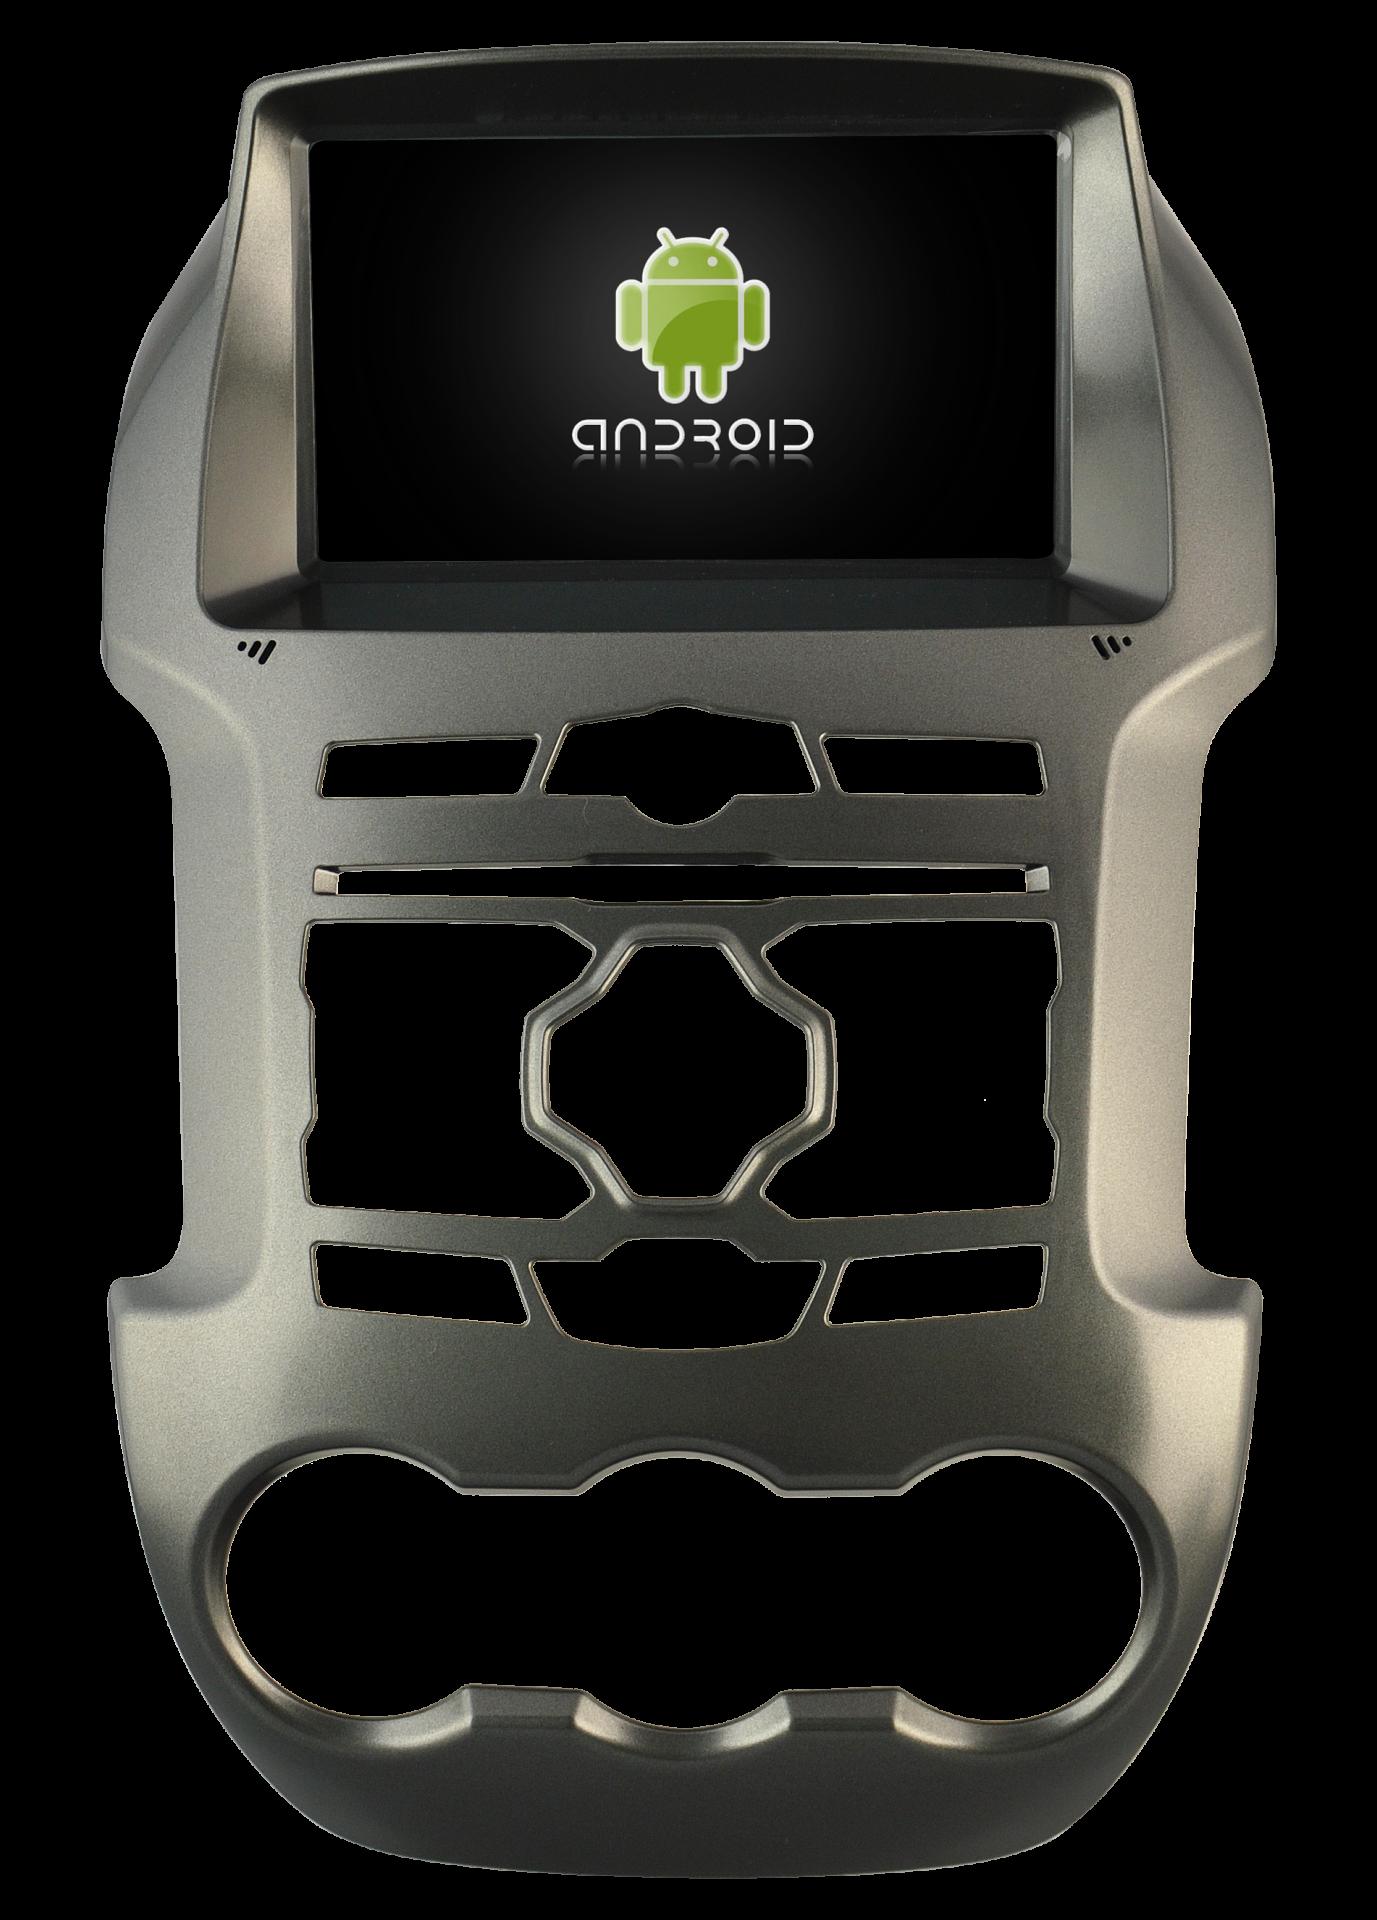 Autoradio gps bluetooth ford ranger android camera de recul commande au volant ipod tv dvbt 3g 4g pas cher wifi poste usb sd tnt double 2 din canbus iphone samsung www gps navigati